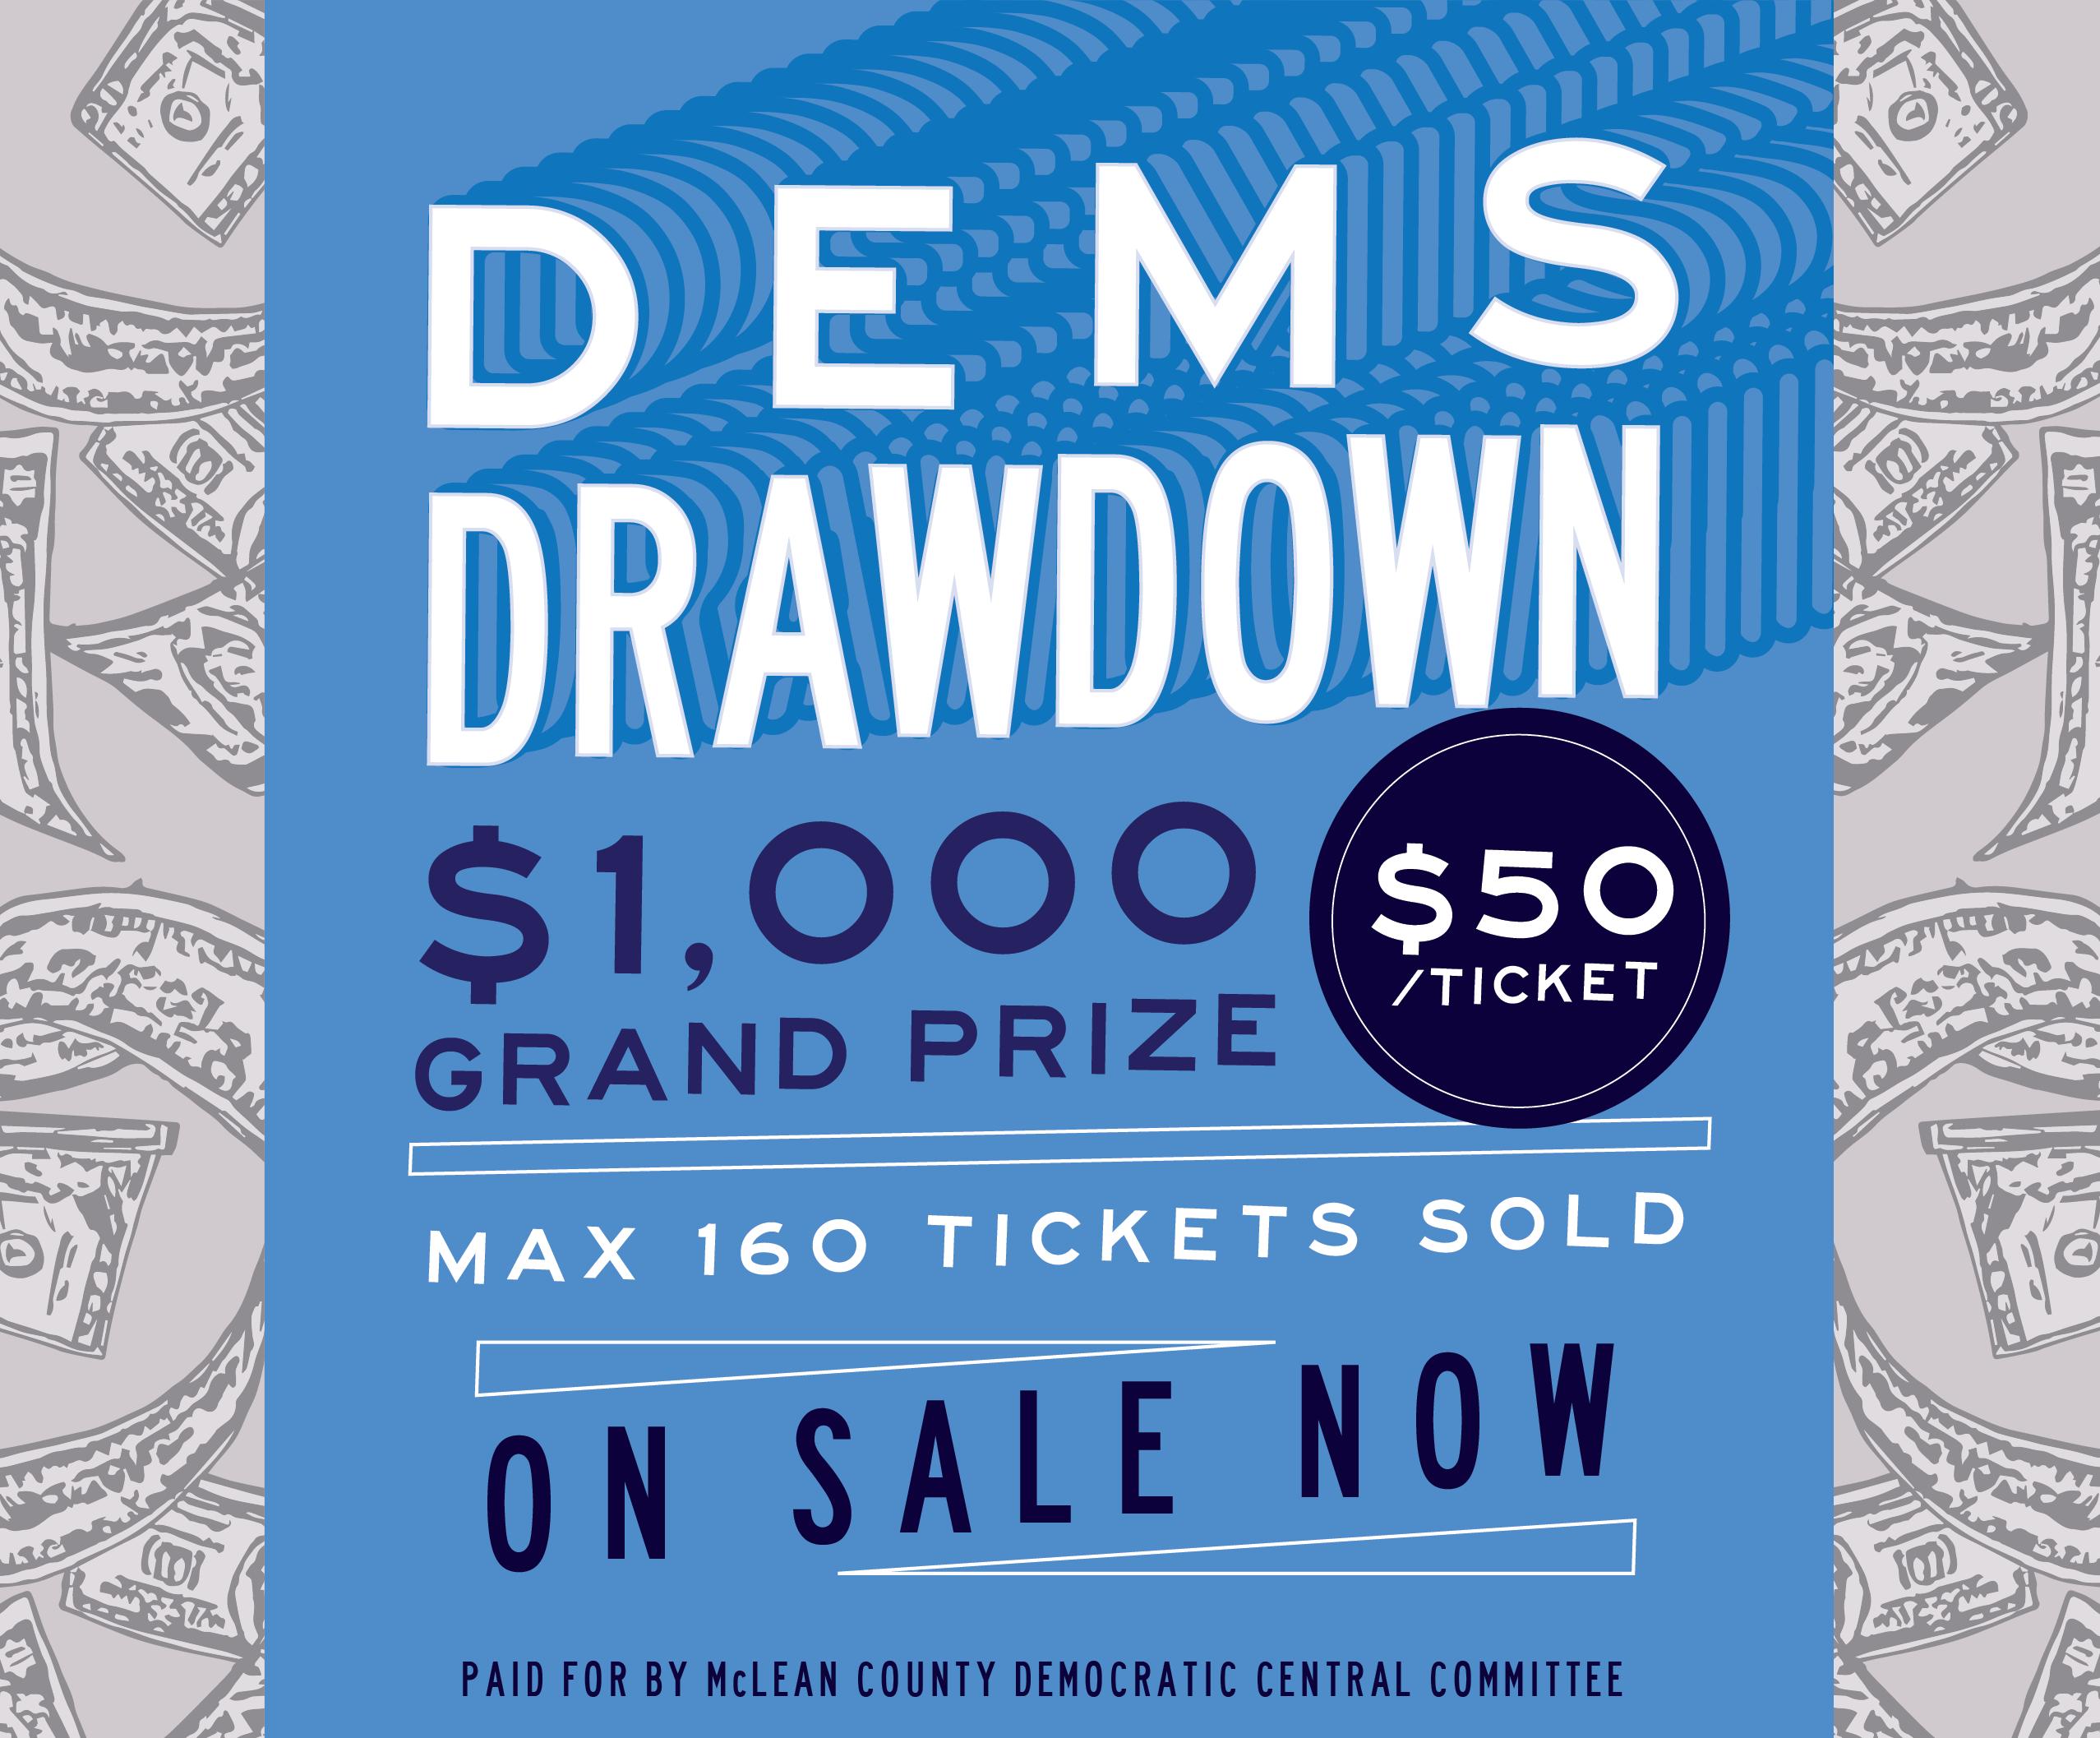 Dems Draw Down